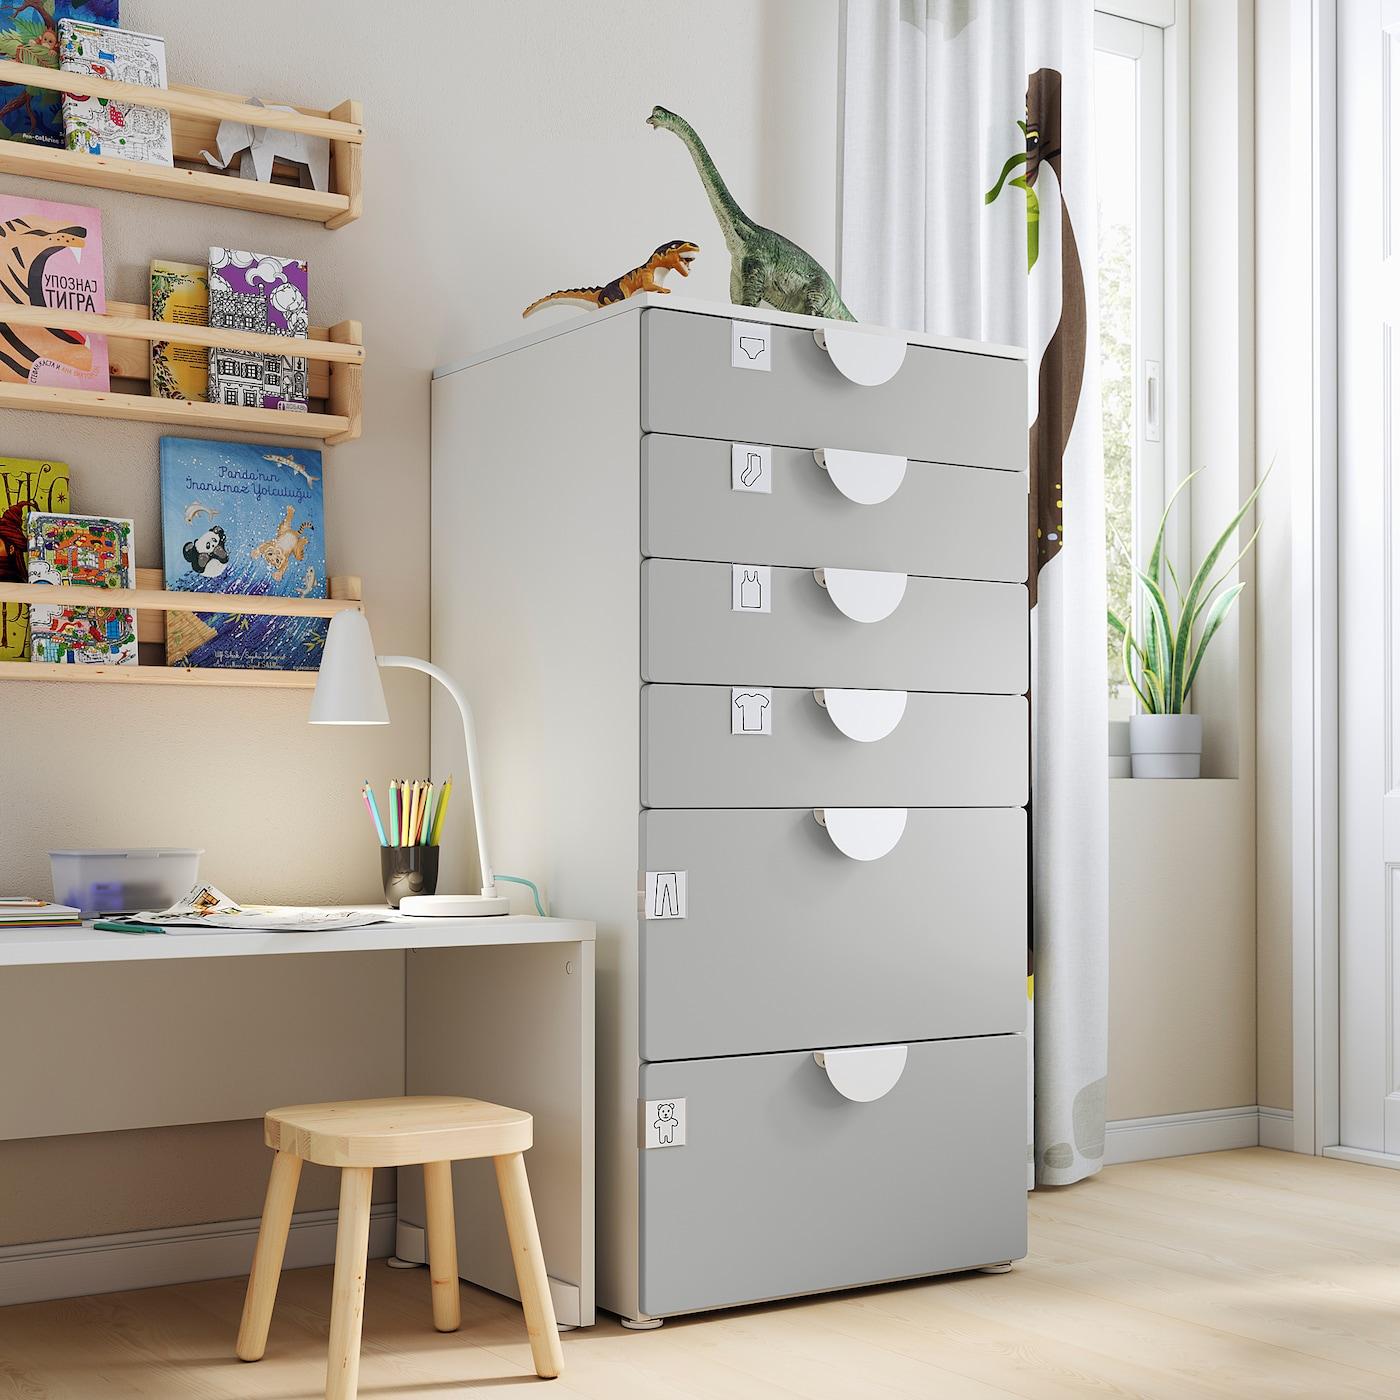 SMÅSTAD / PLATSA Ladekast 6 lades, wit/grijs, 60x57x123 cm